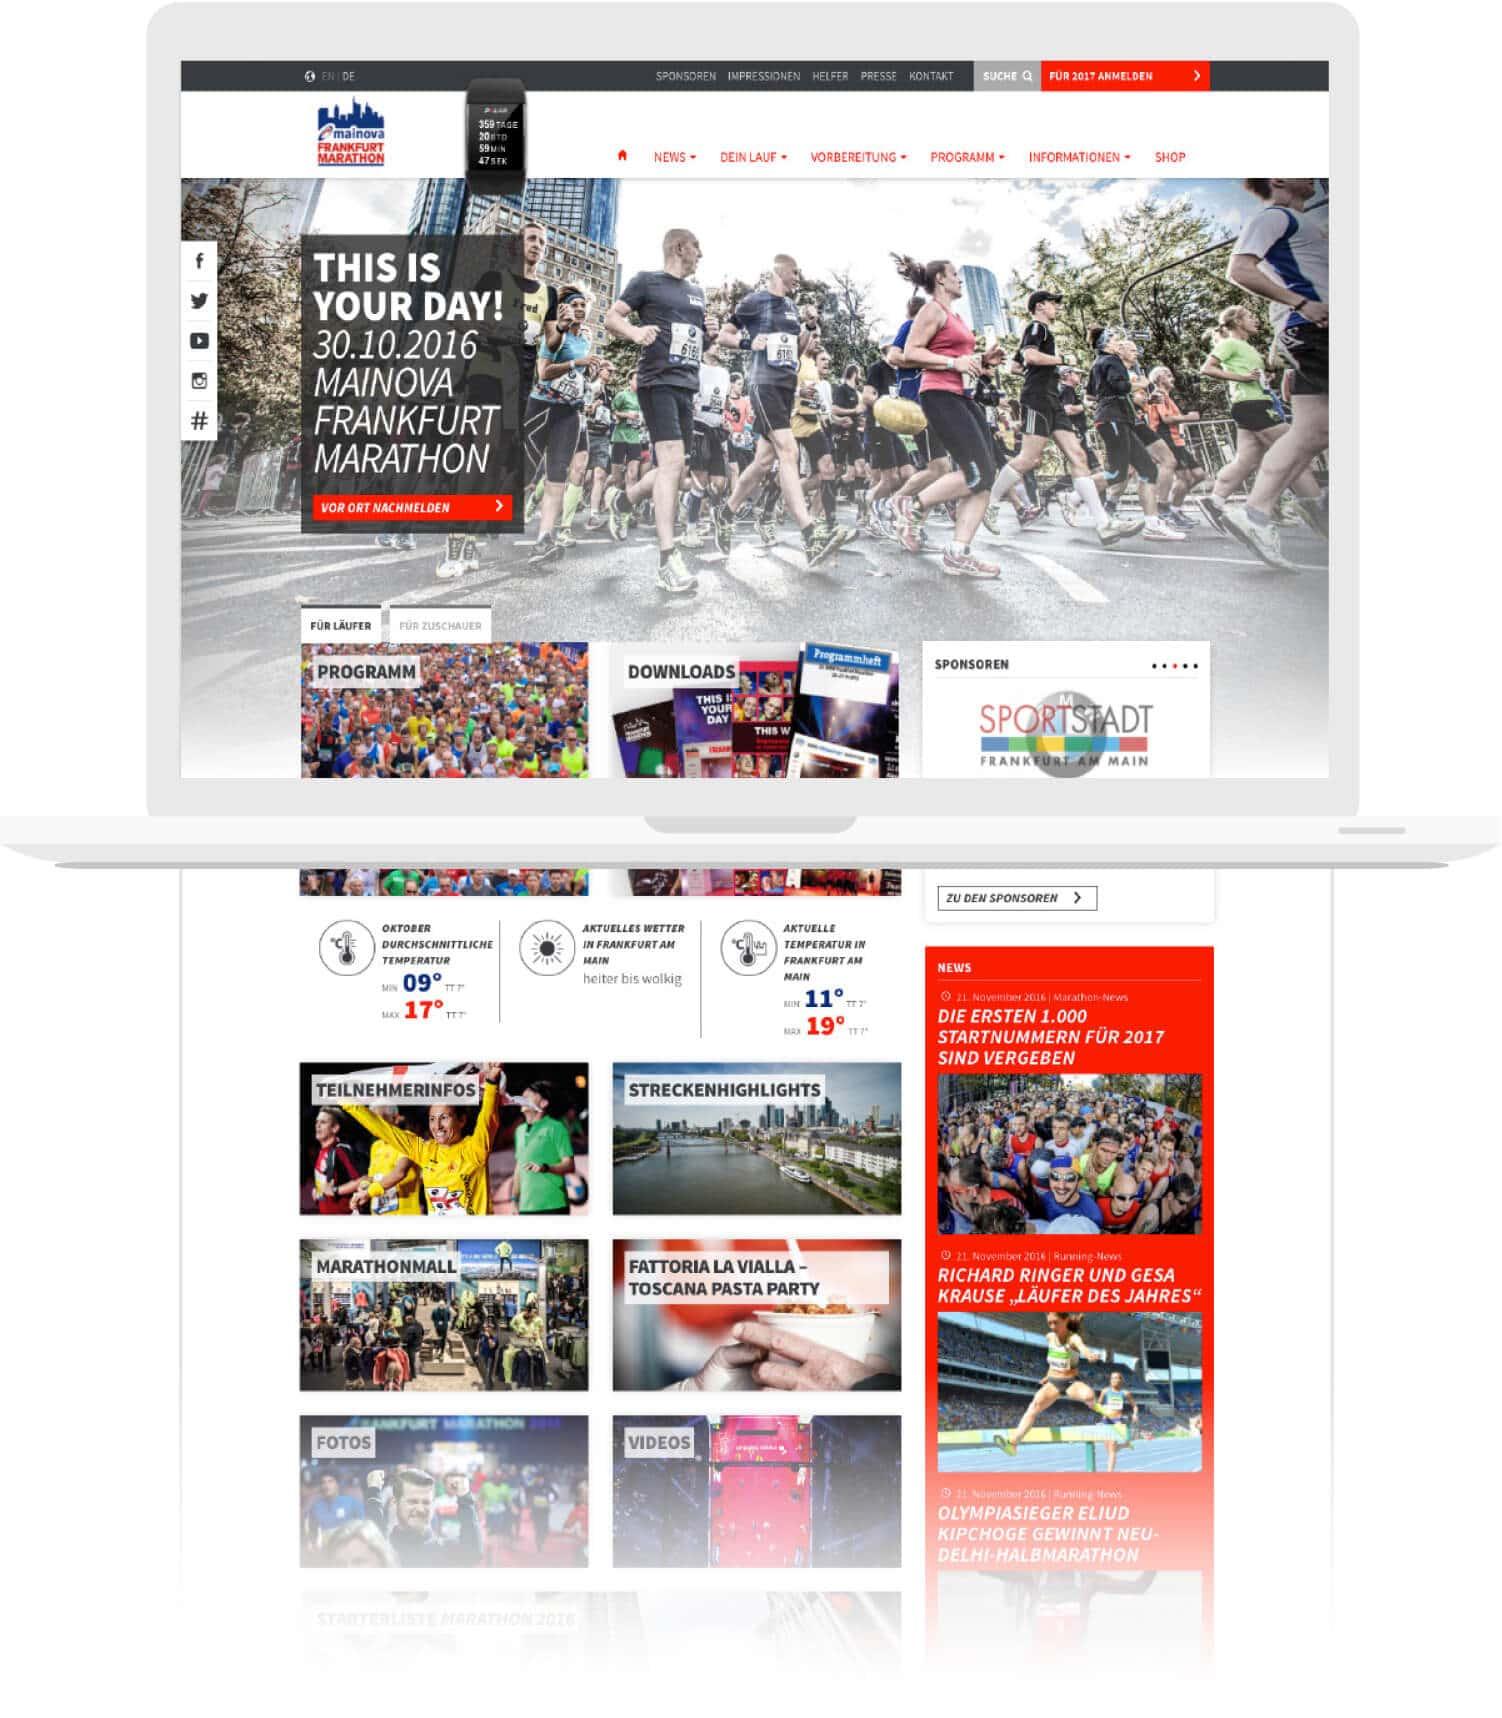 360VIER_Frankfurt-Marathon_Case-Study_image-02 Frankfurt Marathon